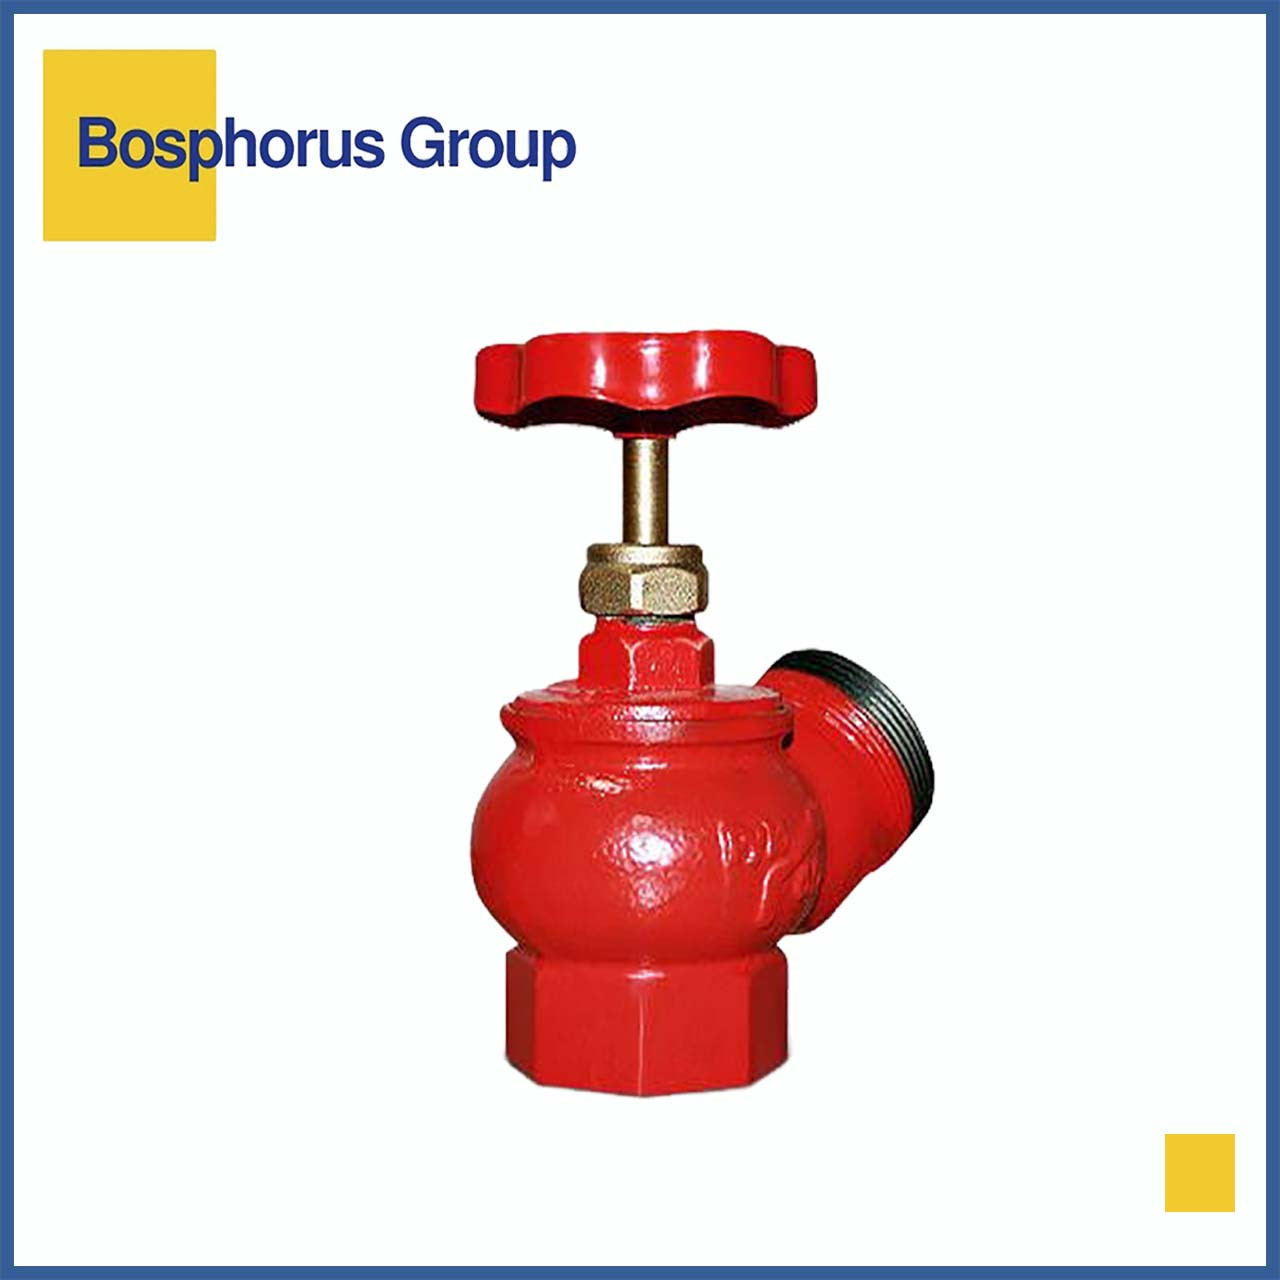 Кран (клапан) пожарный чугунный муфта-цапка Ду 65 (КНР)